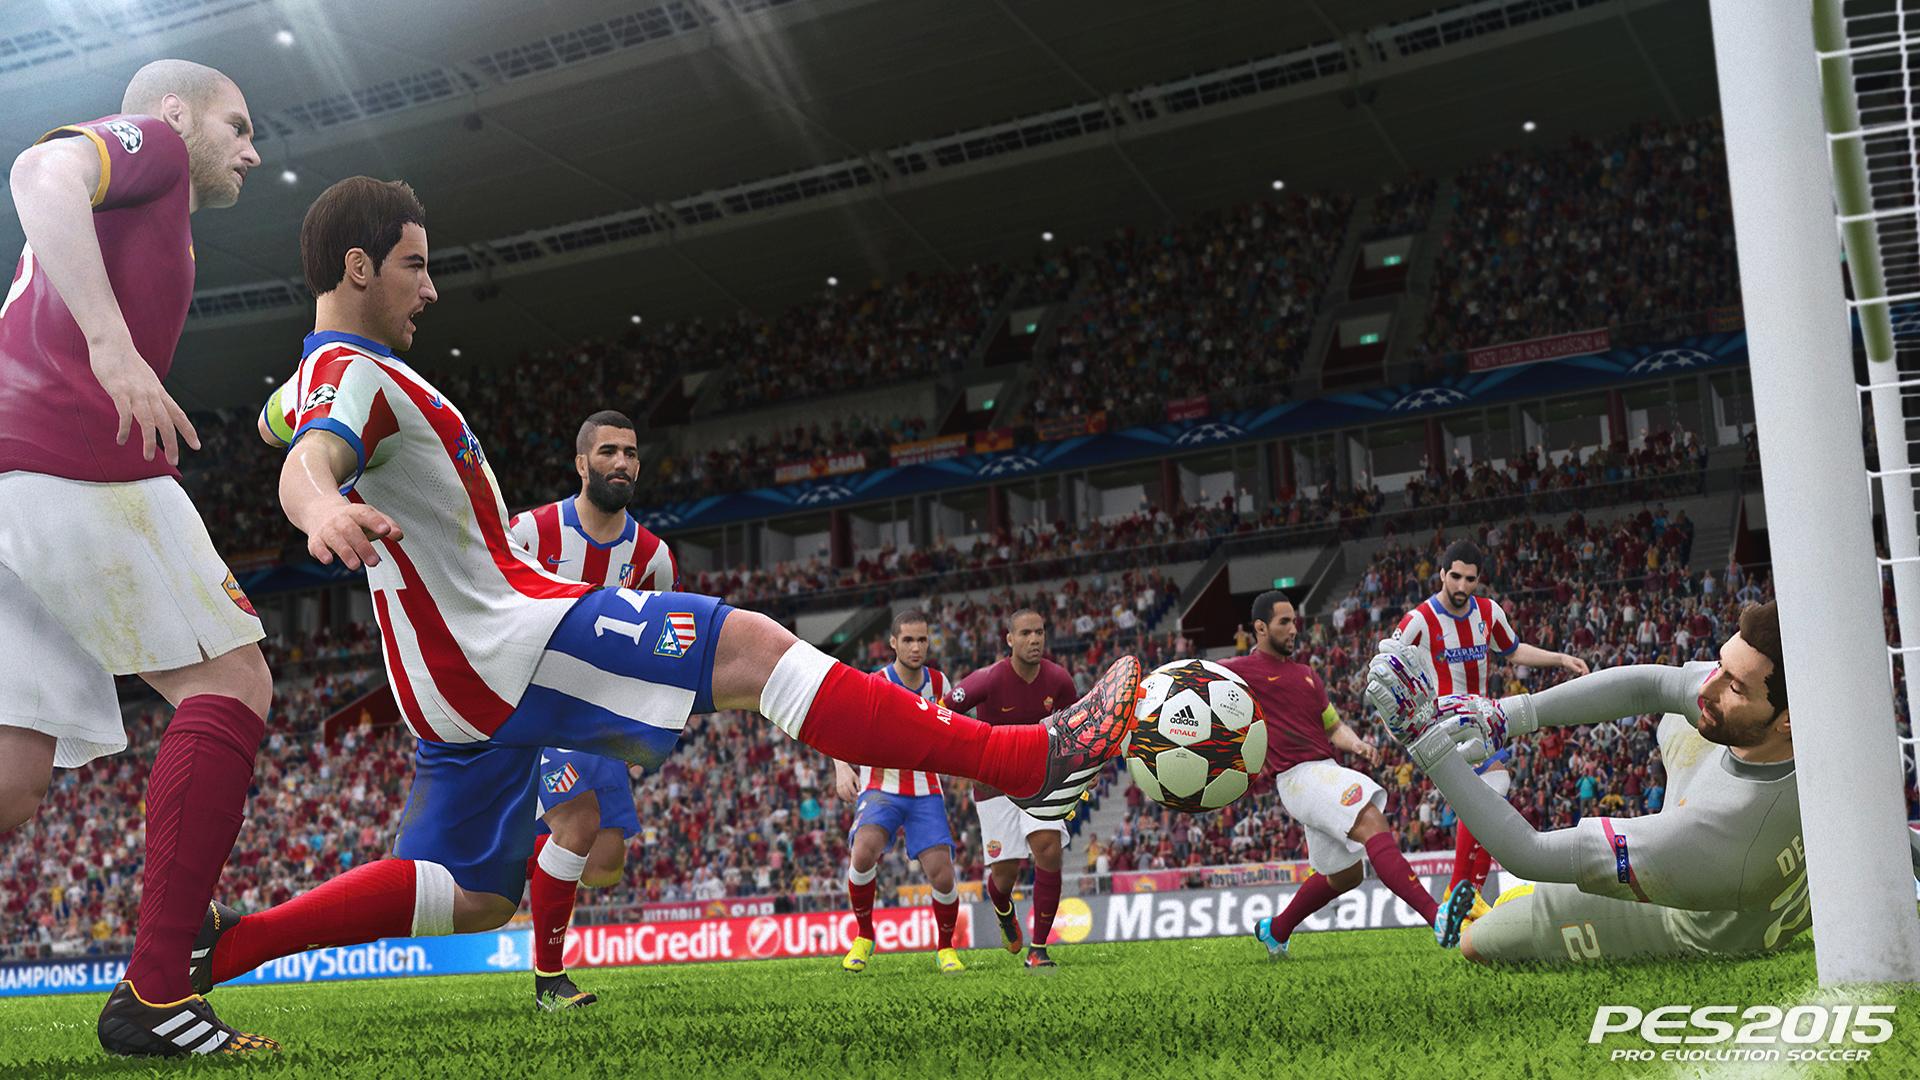 Pro Evolution Soccer 2015 PC Multilenguaje ESPAÑOL + Update v1.03 (RELOADED) 6